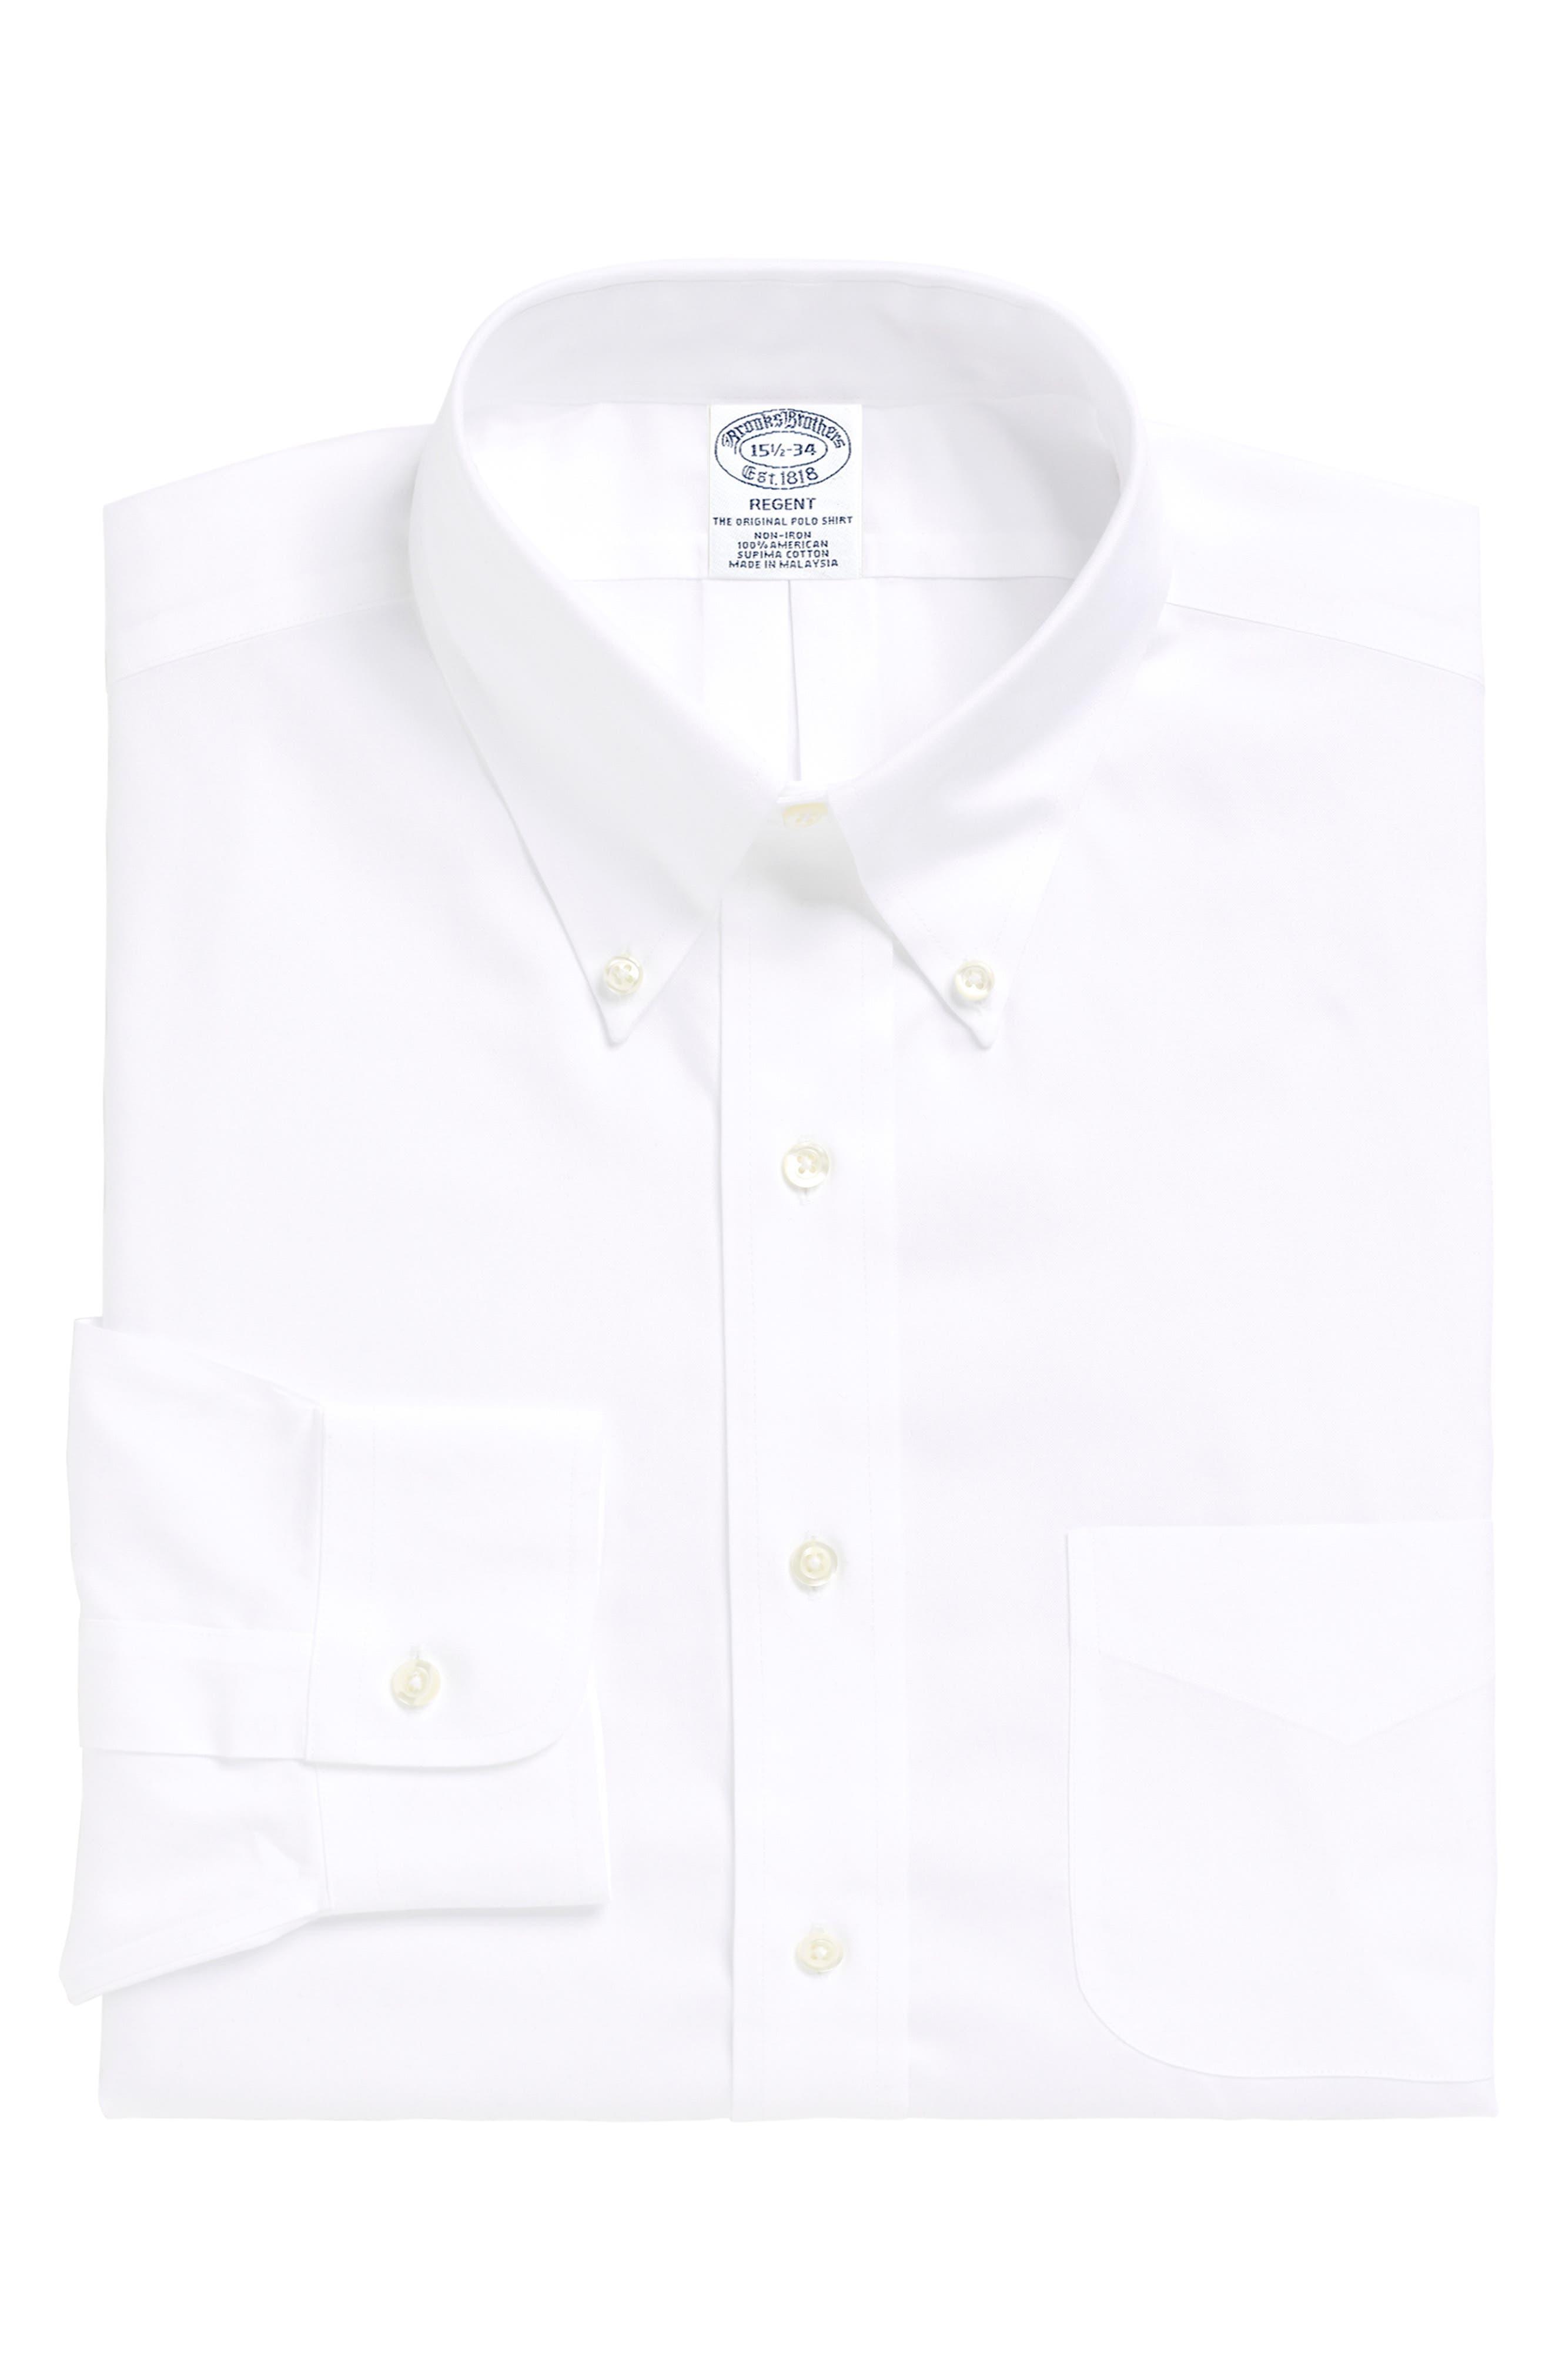 Regular Fit Solid Dress Shirt,                         Main,                         color, WHITE